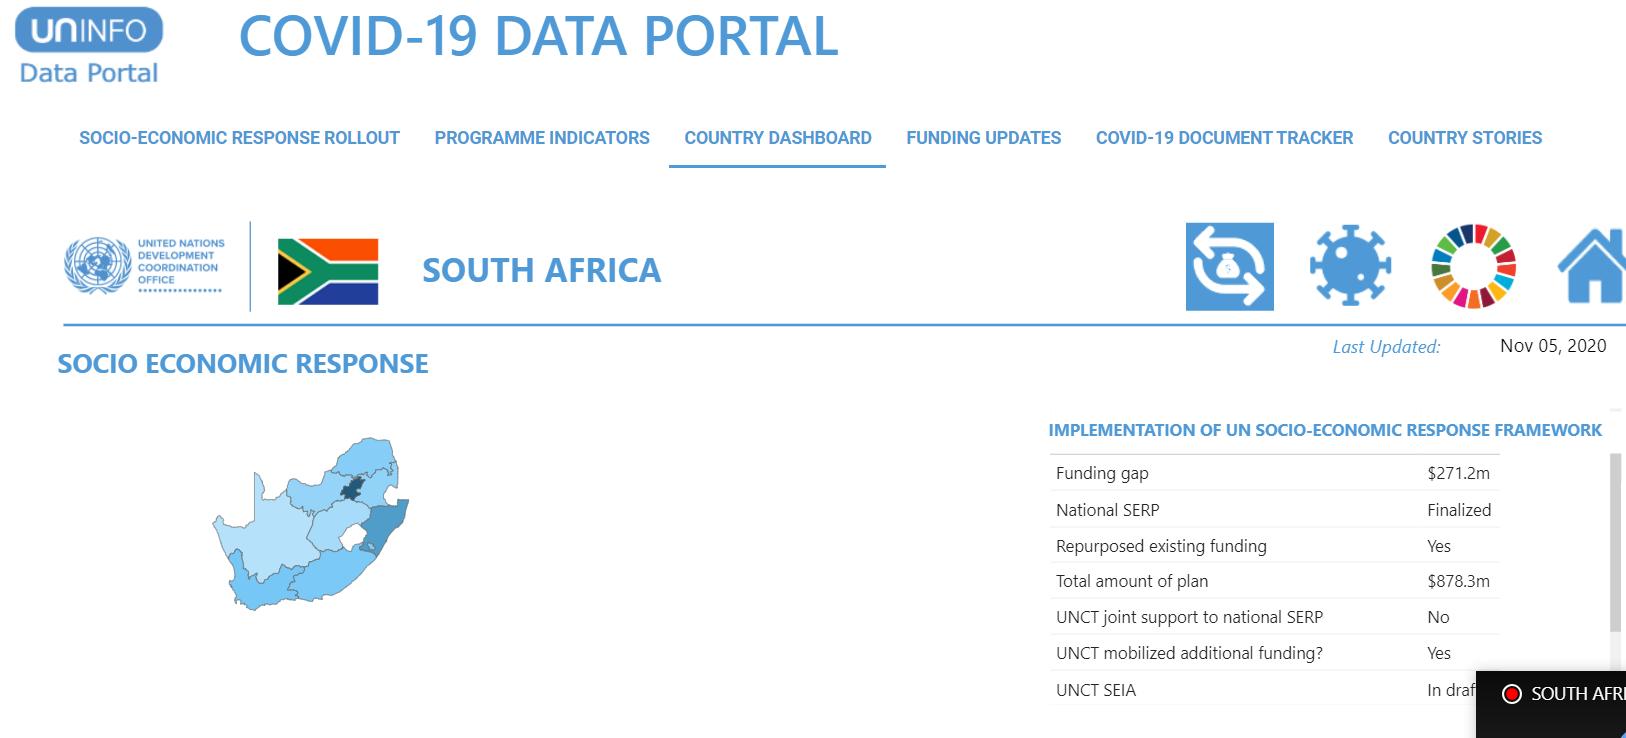 Visit our COVID-19 Data portal